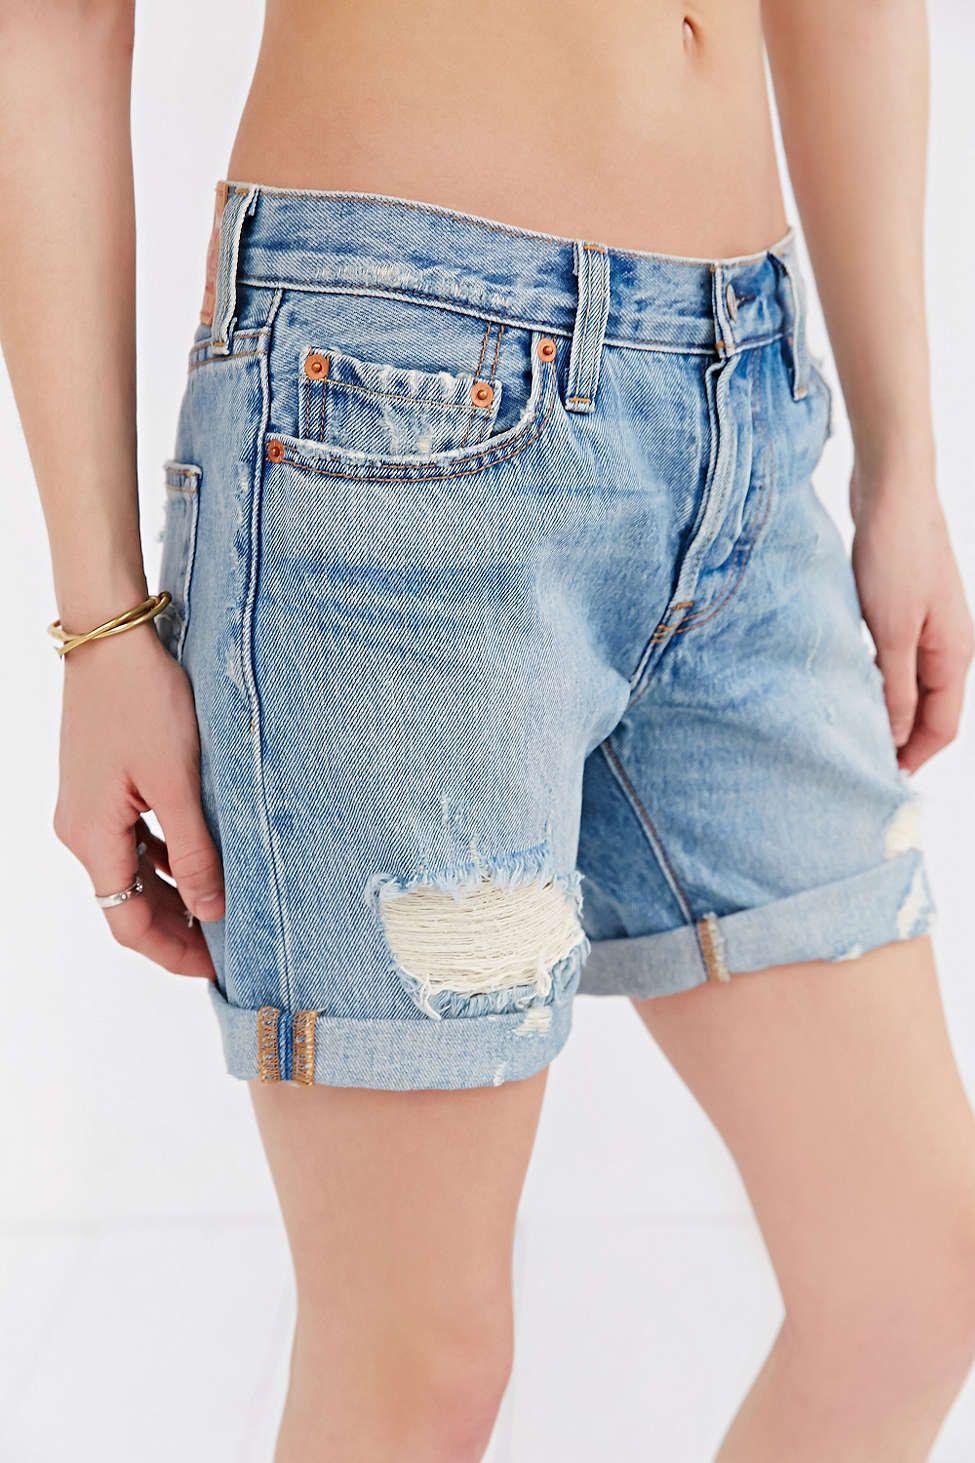 acd9ffa3 Levis 501 Long-Hem Jean Short - Urban Outfitters | #UODenim | Hem ...